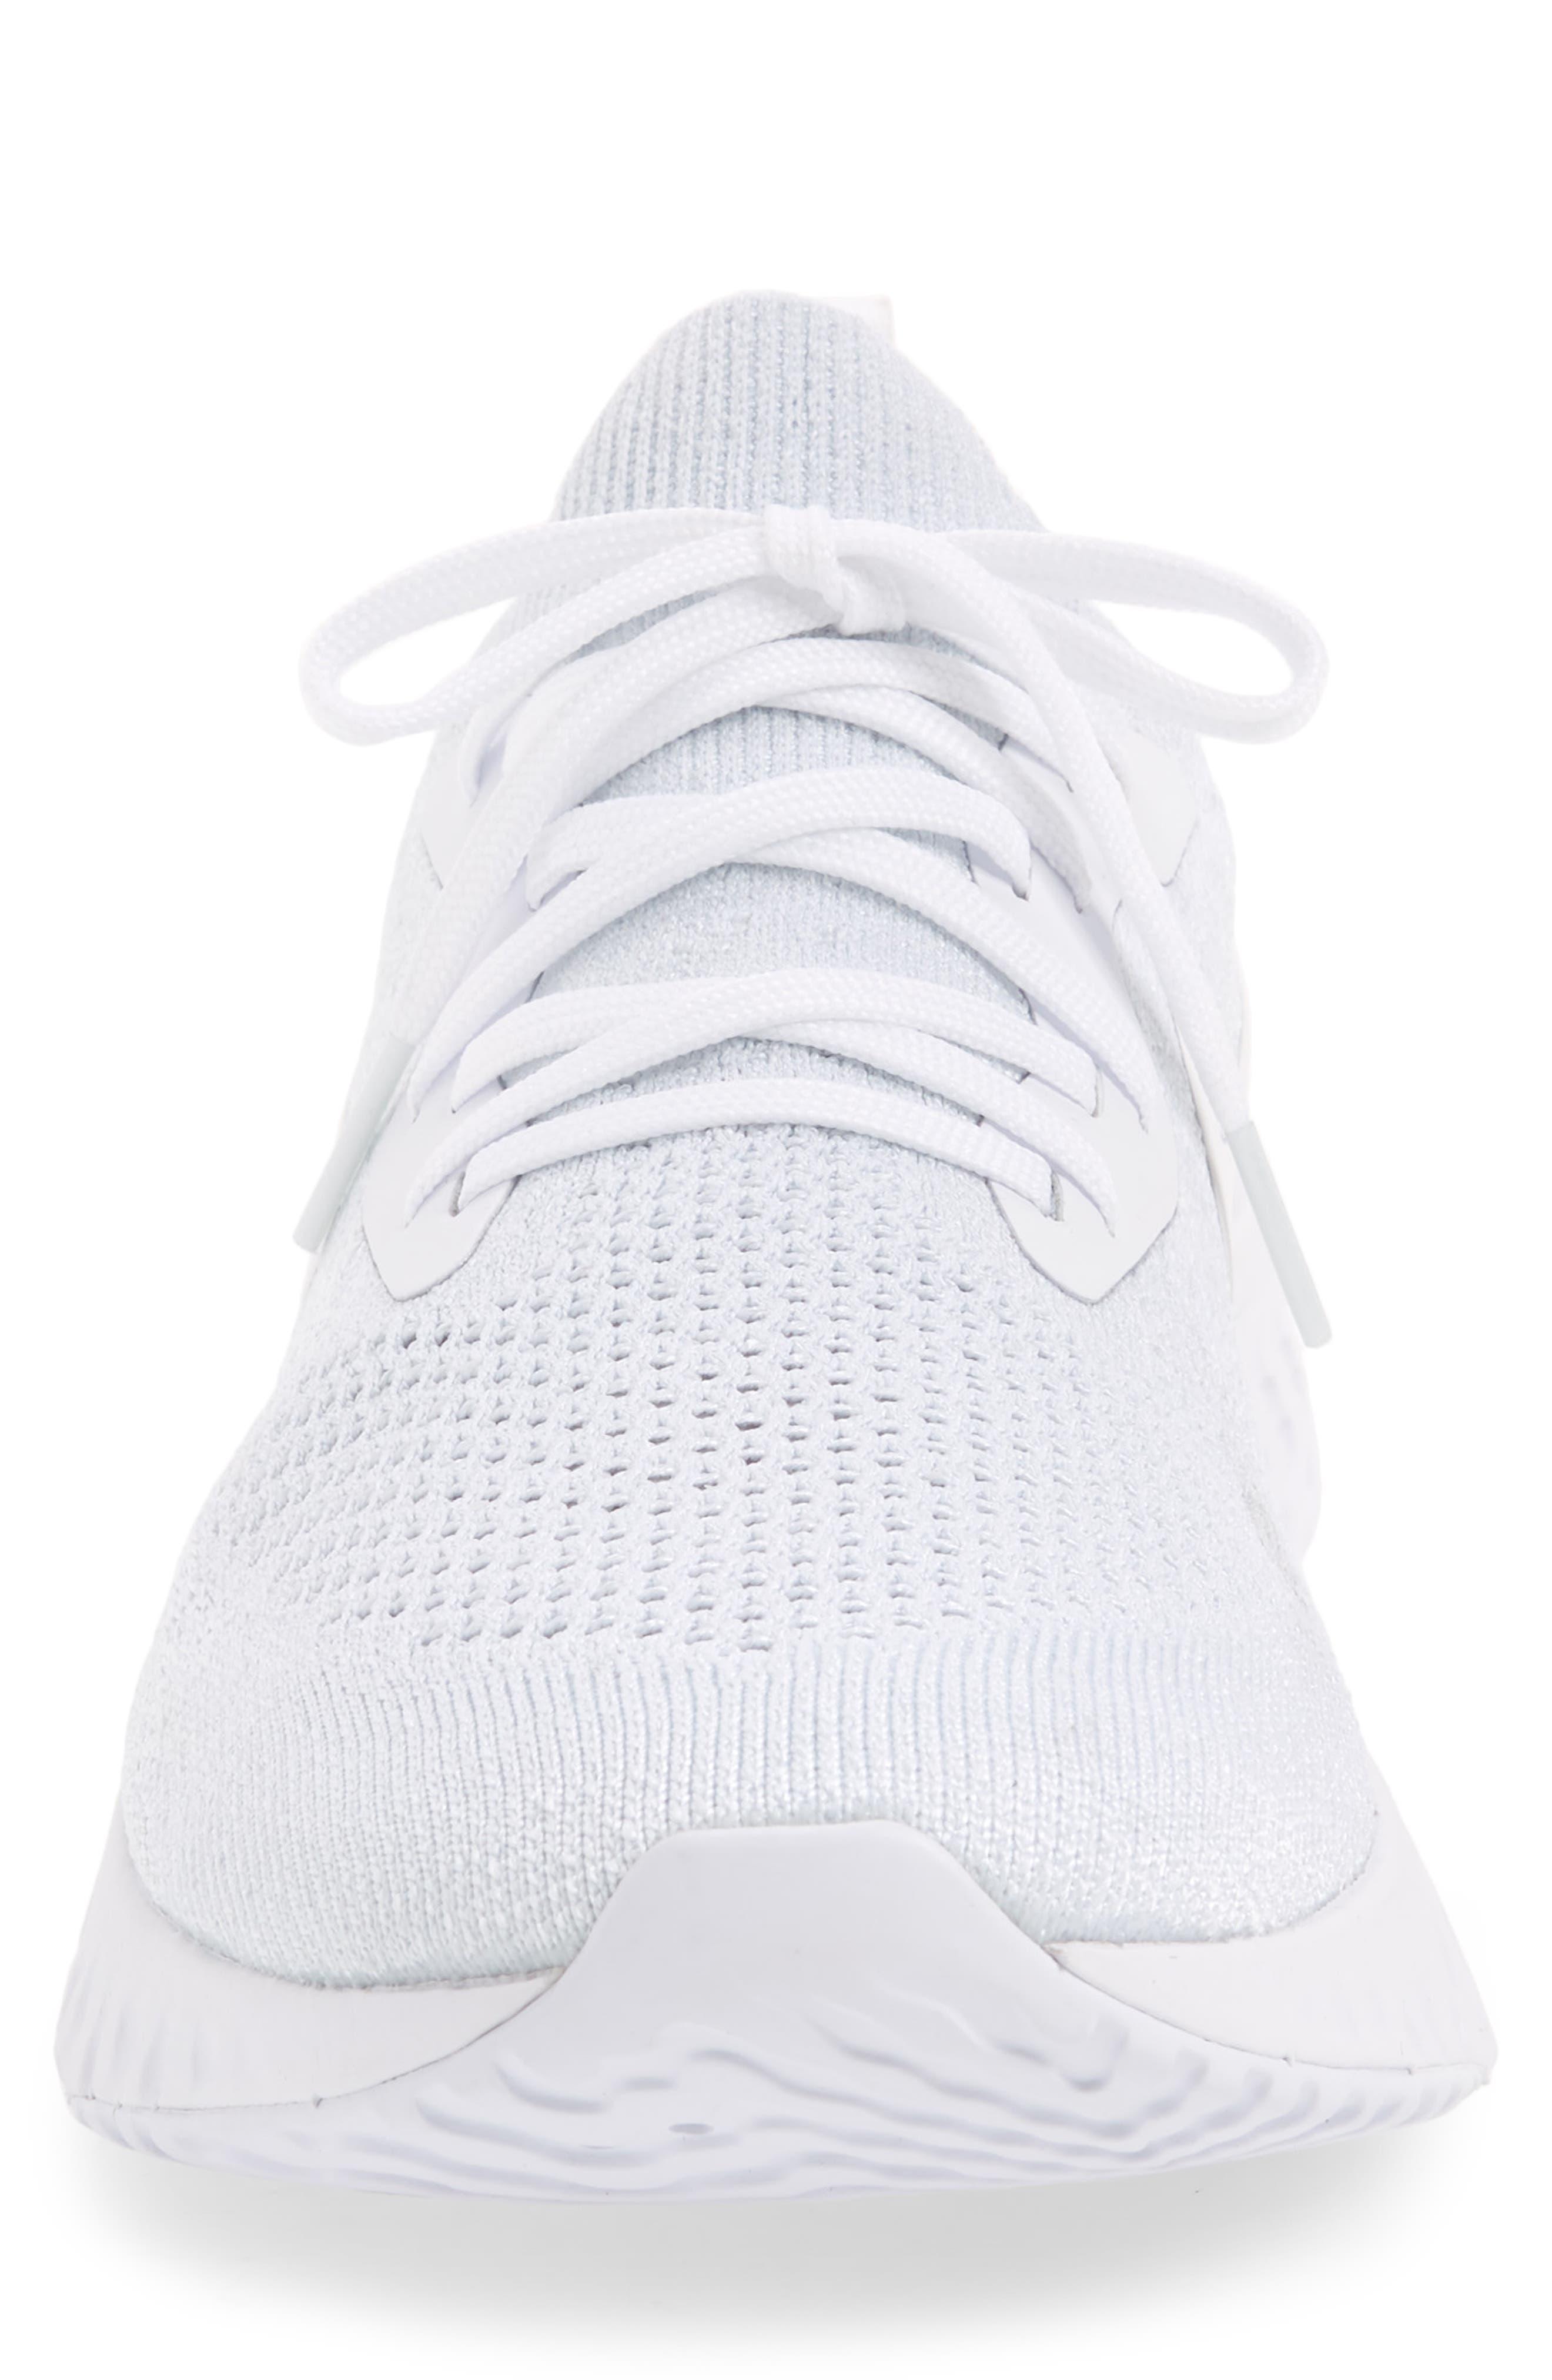 Epic React Flyknit Running Shoe,                             Alternate thumbnail 5, color,                             White